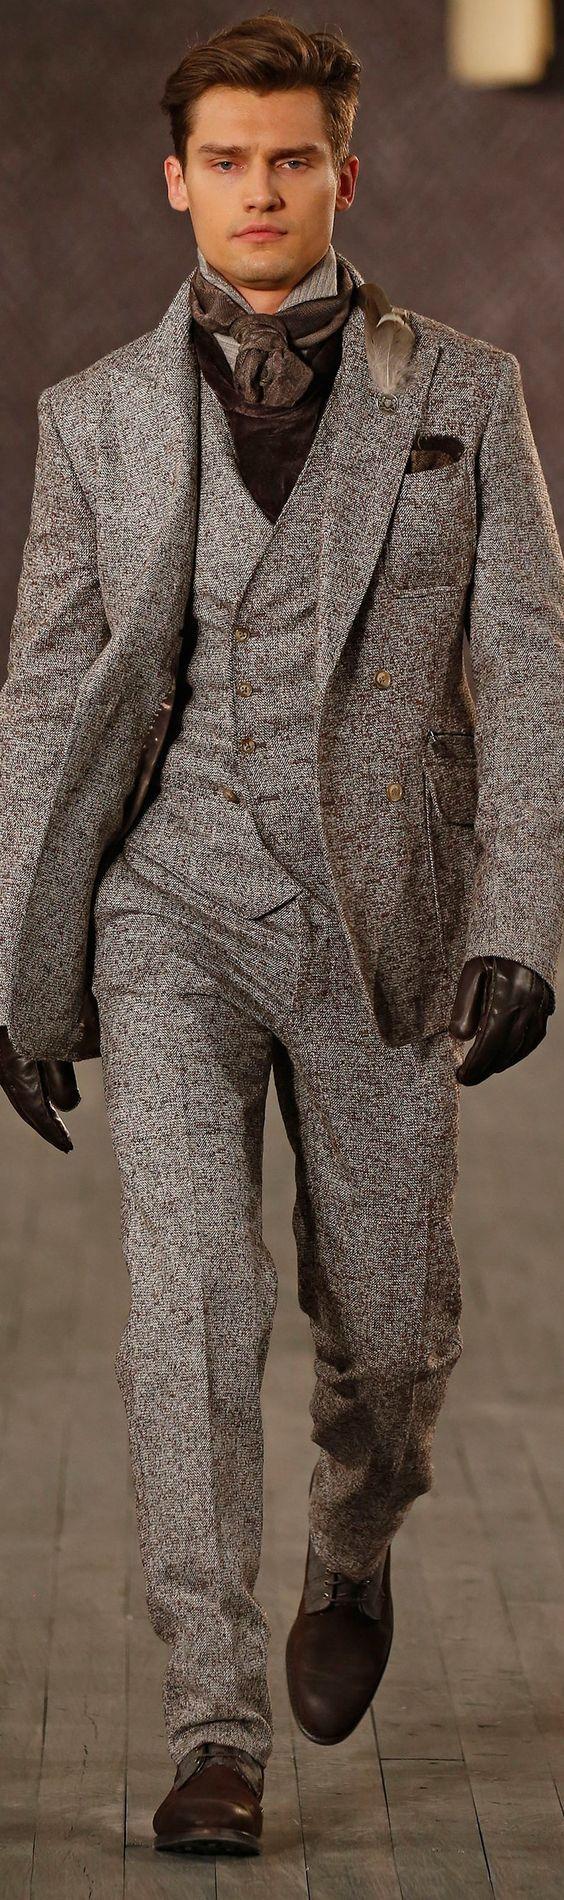 Best 25+ Winter suit ideas on Pinterest | Best suits, Wear